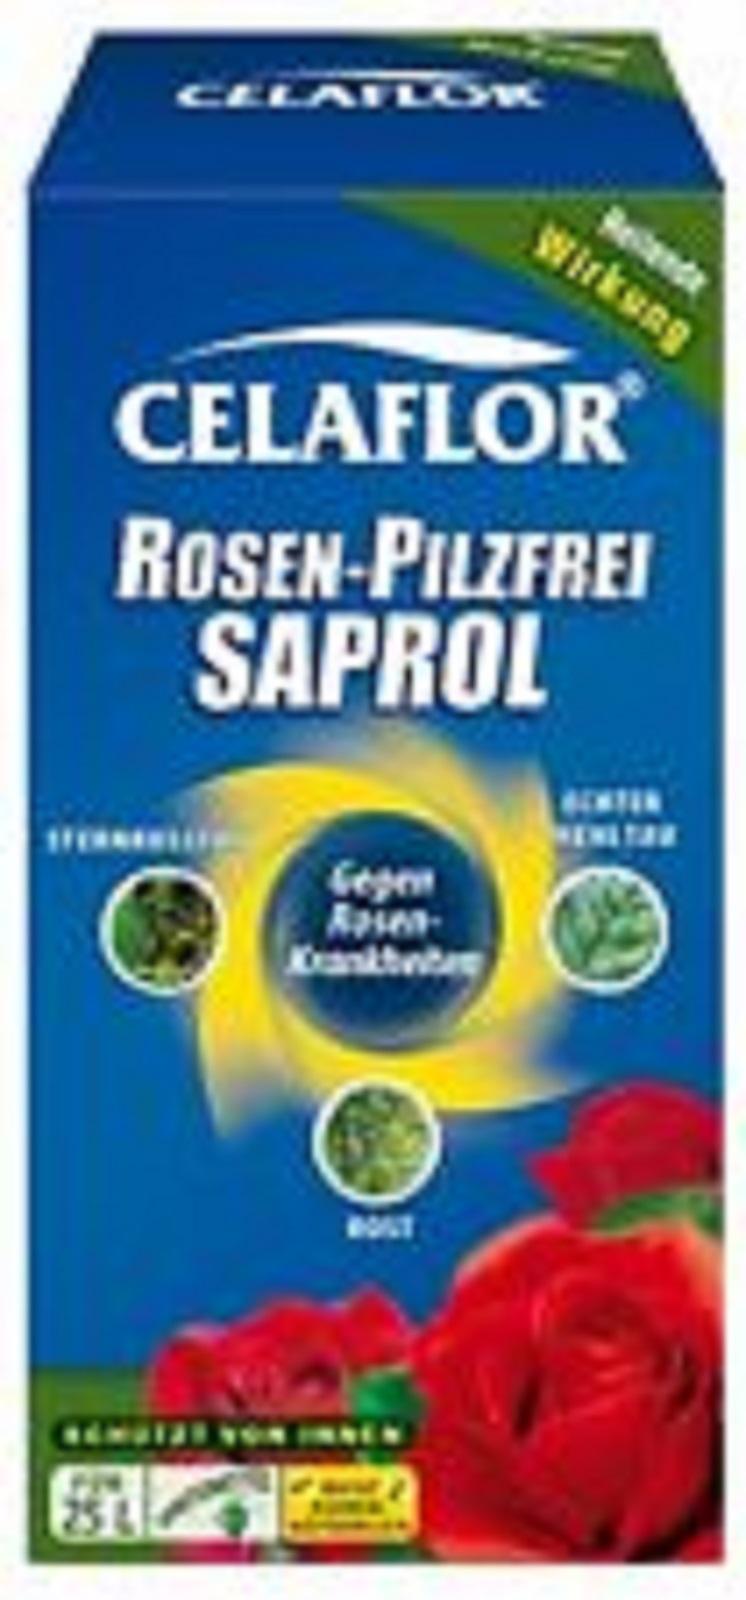 Celaflor Rosen Pilzfrei Saprol 250 ml